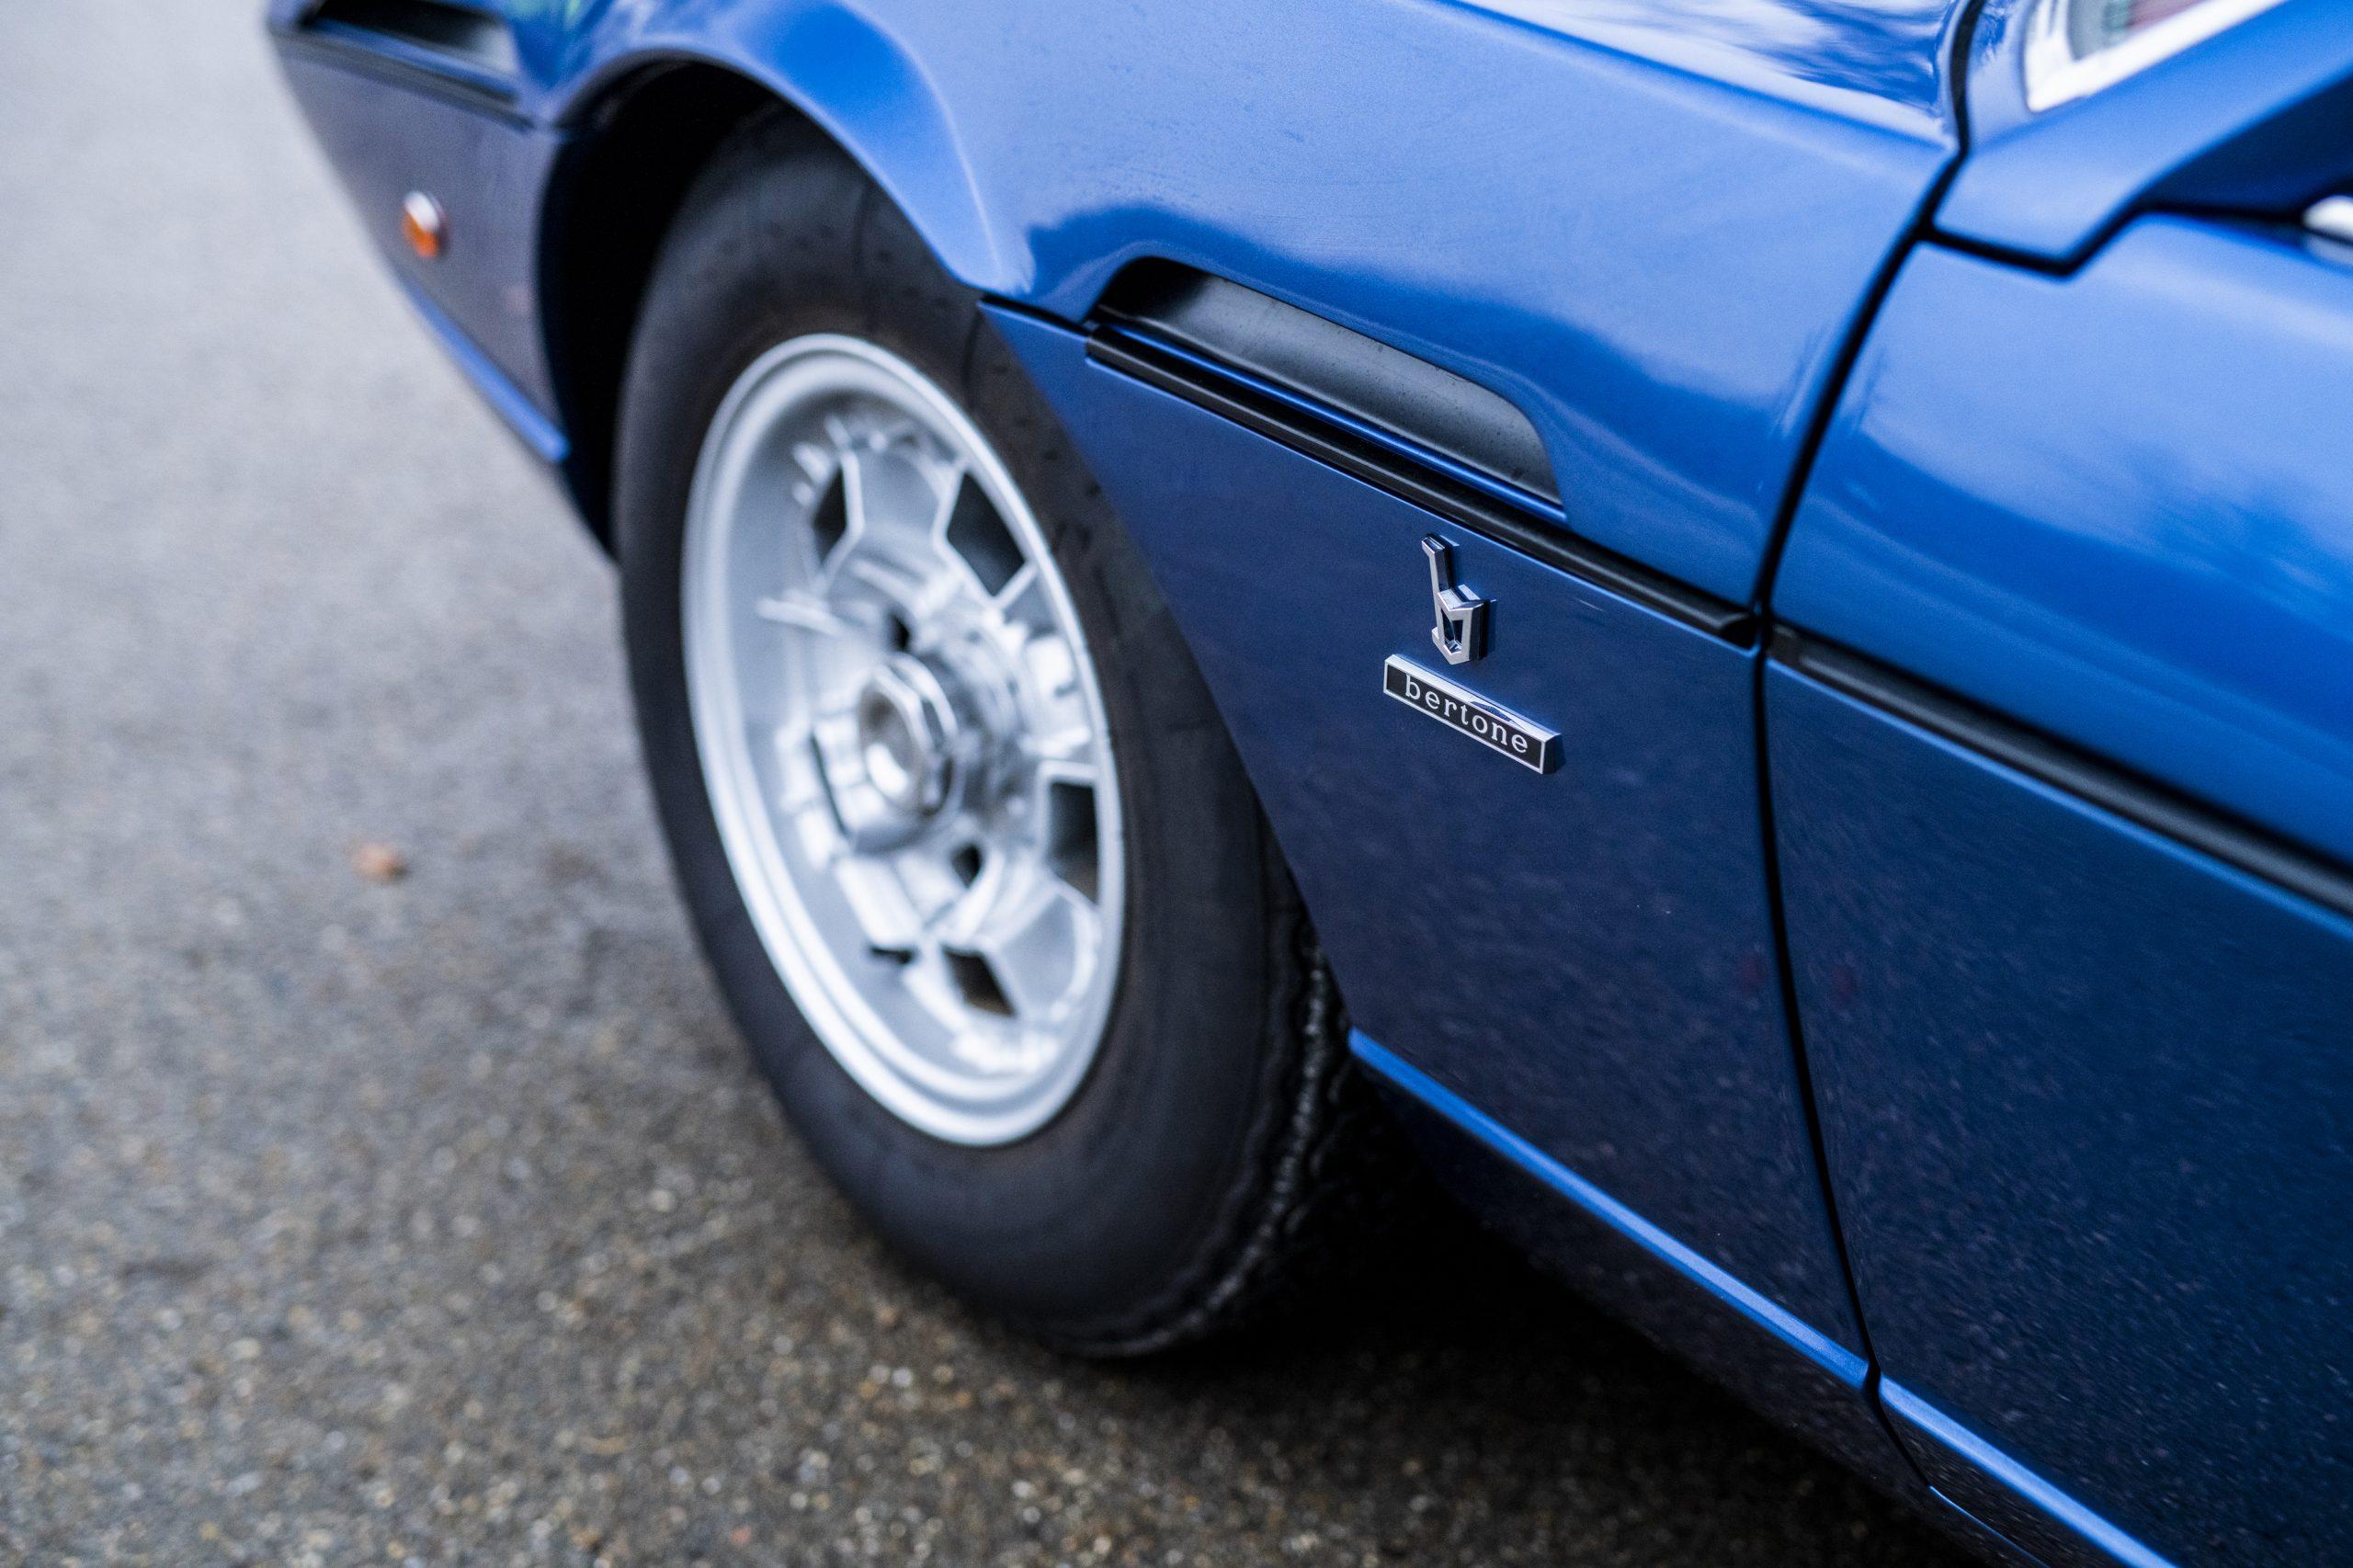 1968 Lamborghini Espada Series I by Bertone front quarter panel badge